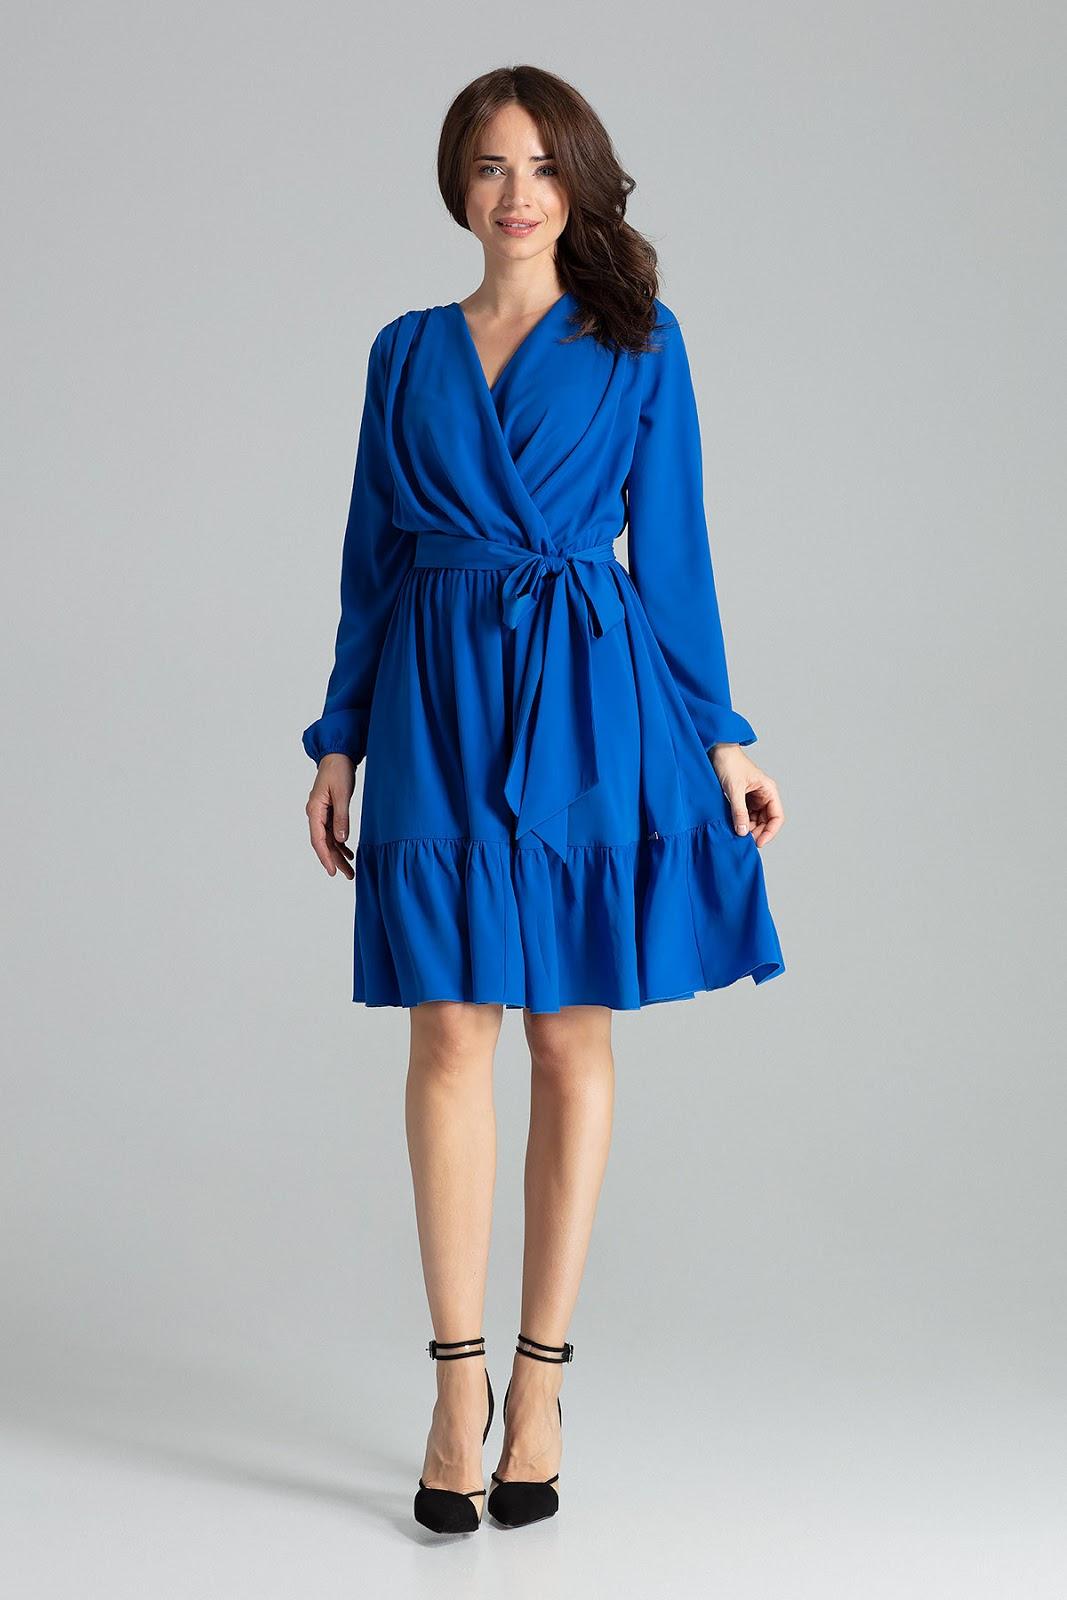 szafirowa sukienka